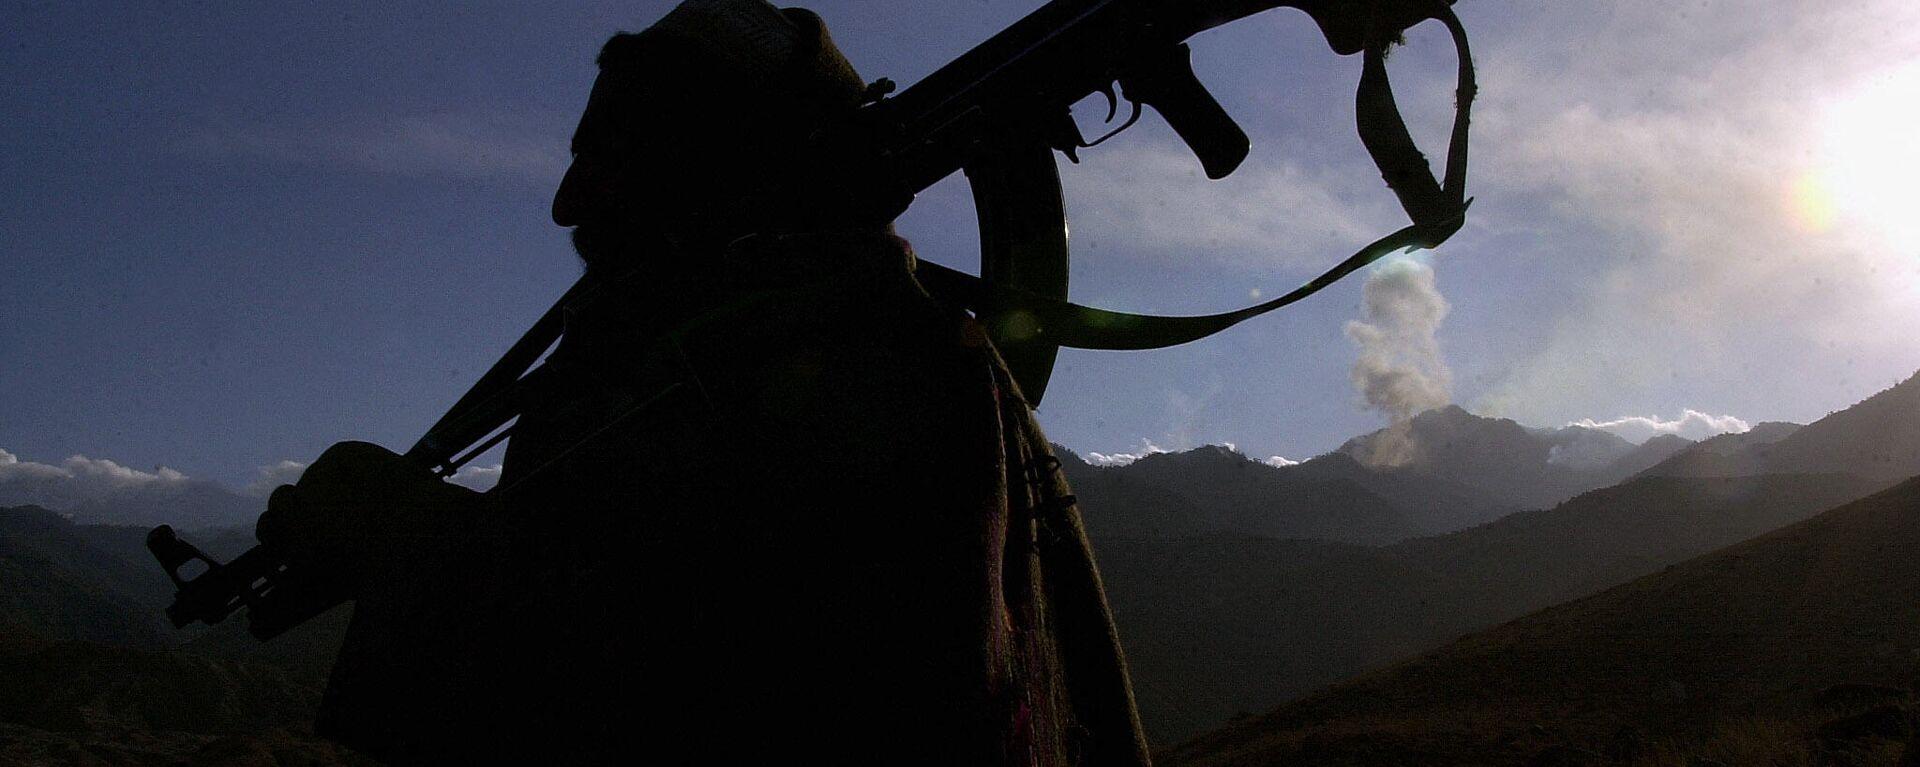 Боевики, запрещенного в РФ, движения Талибан - Sputnik Узбекистан, 1920, 07.07.2021